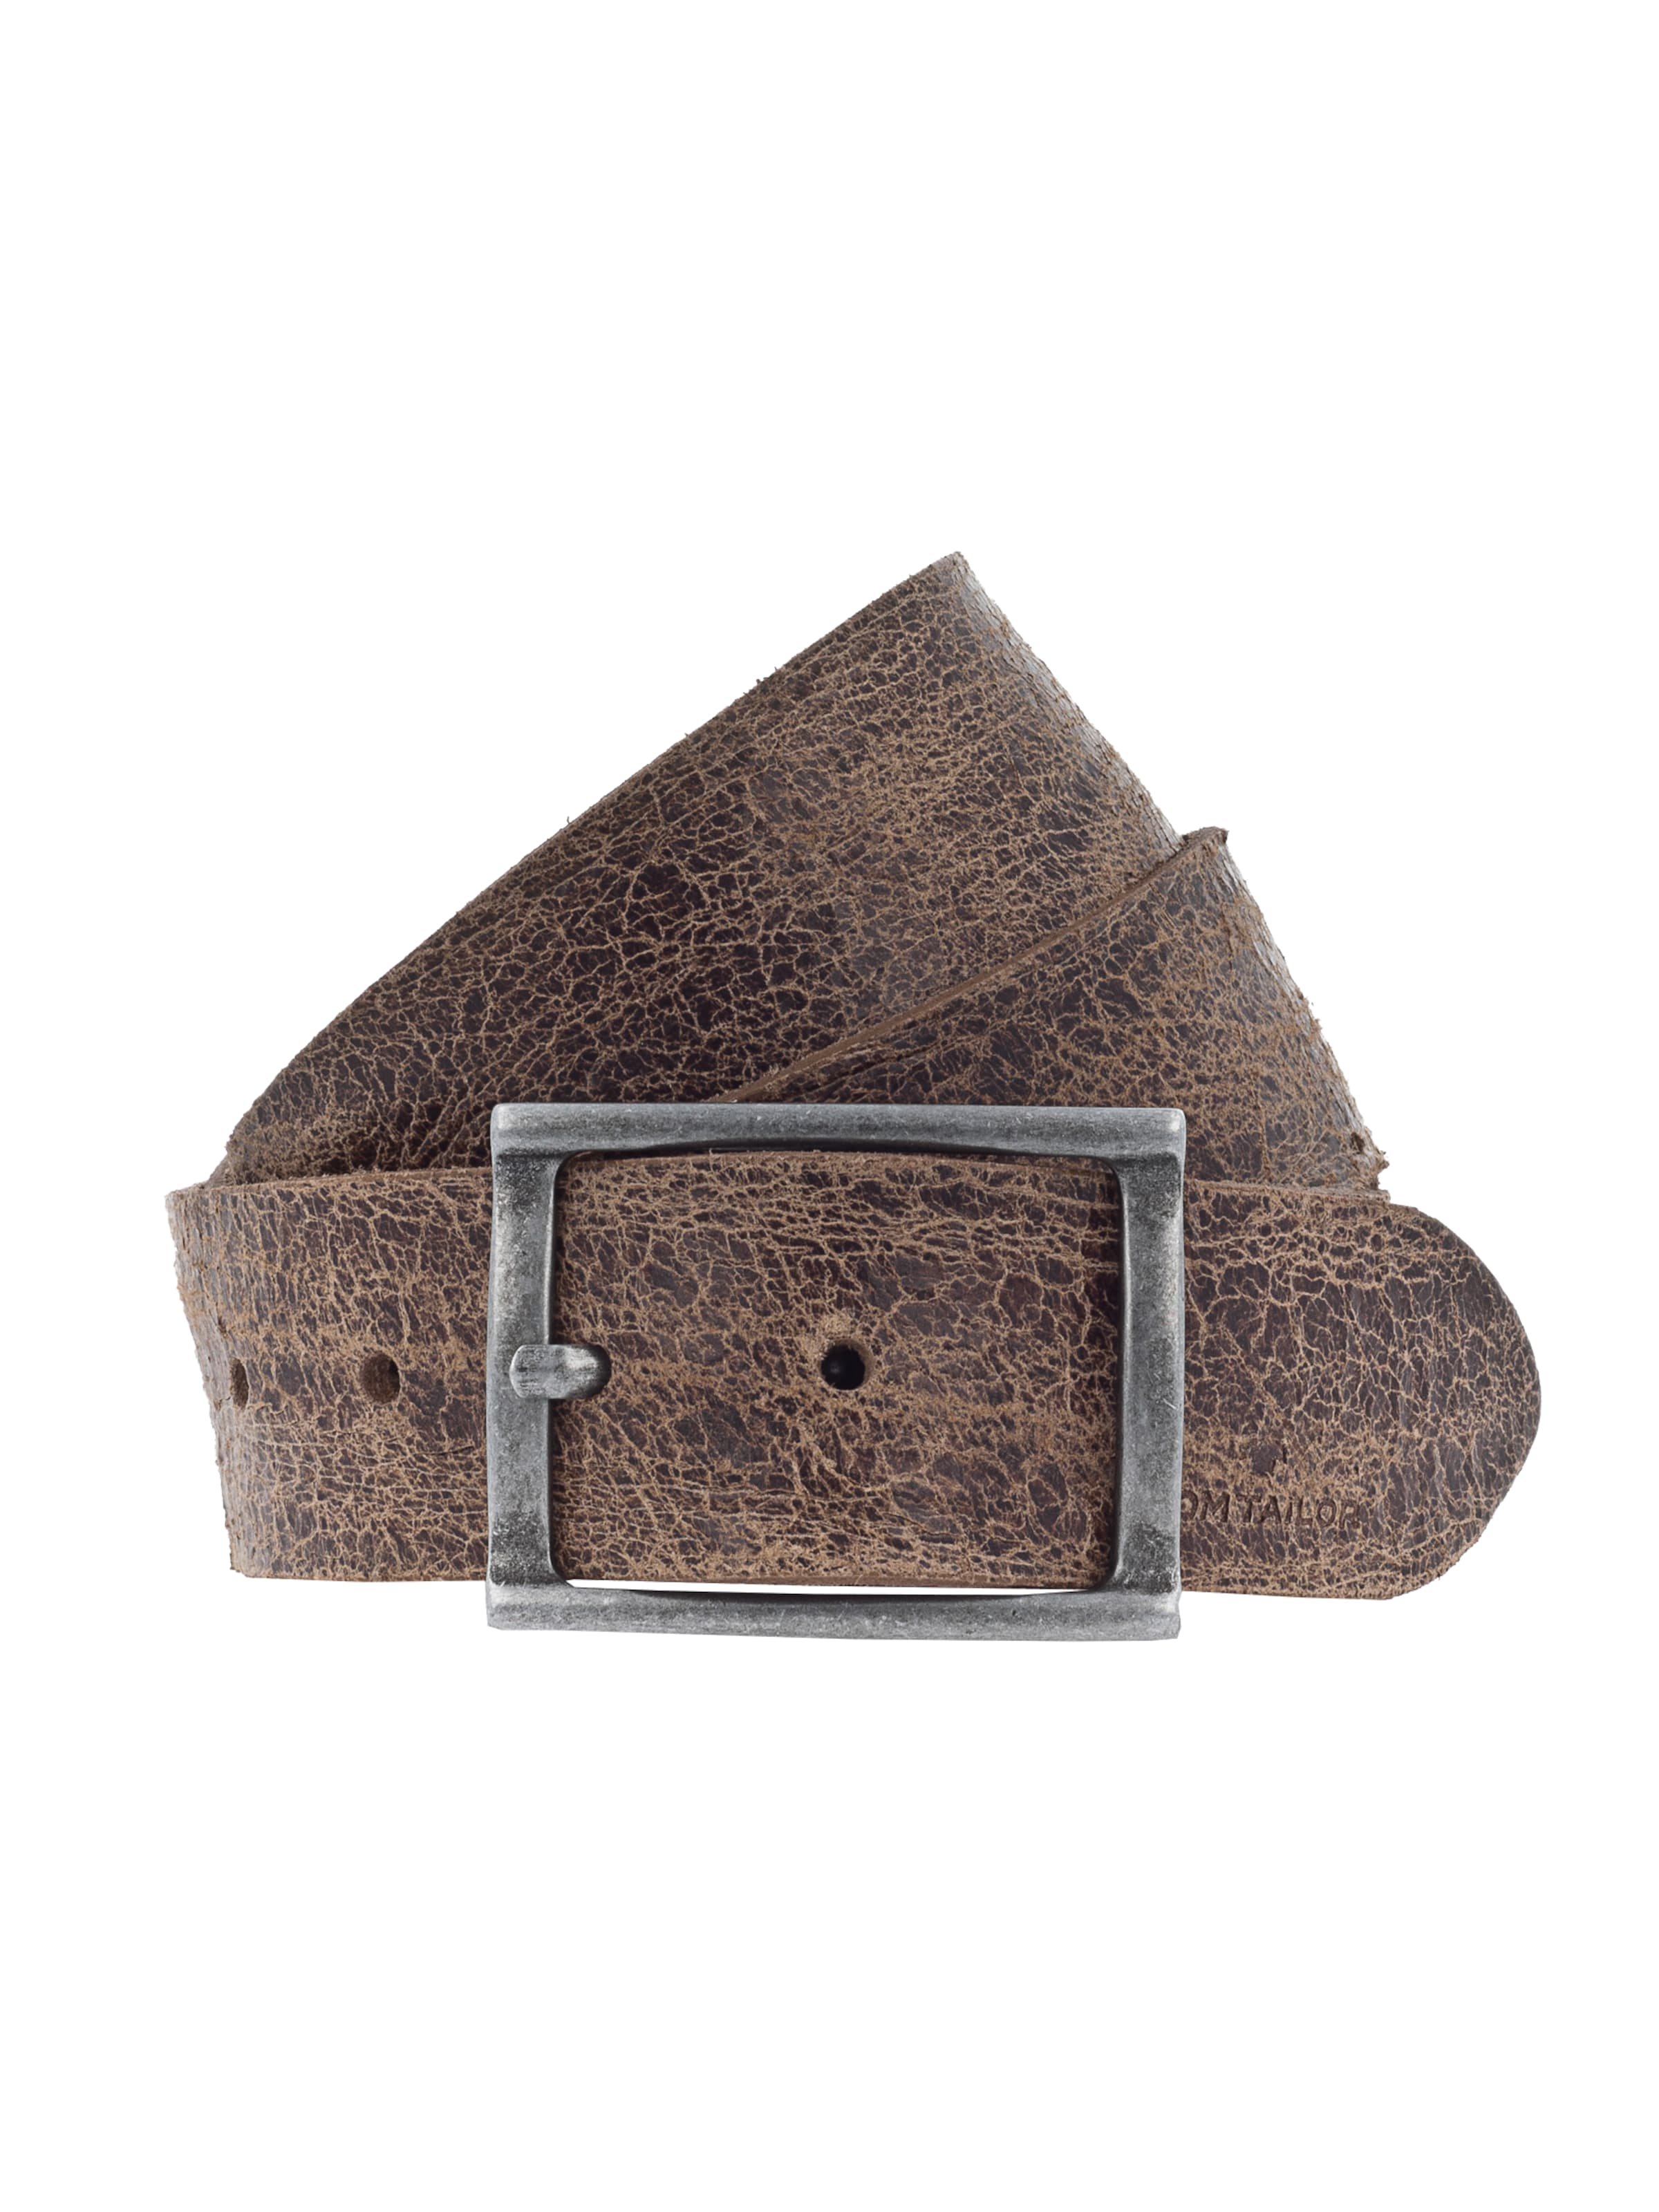 Surface' In WavyCrumpled Cognac Tailor 0cm Gürtel 4 'leather Belt Tom With ul15TJFcK3